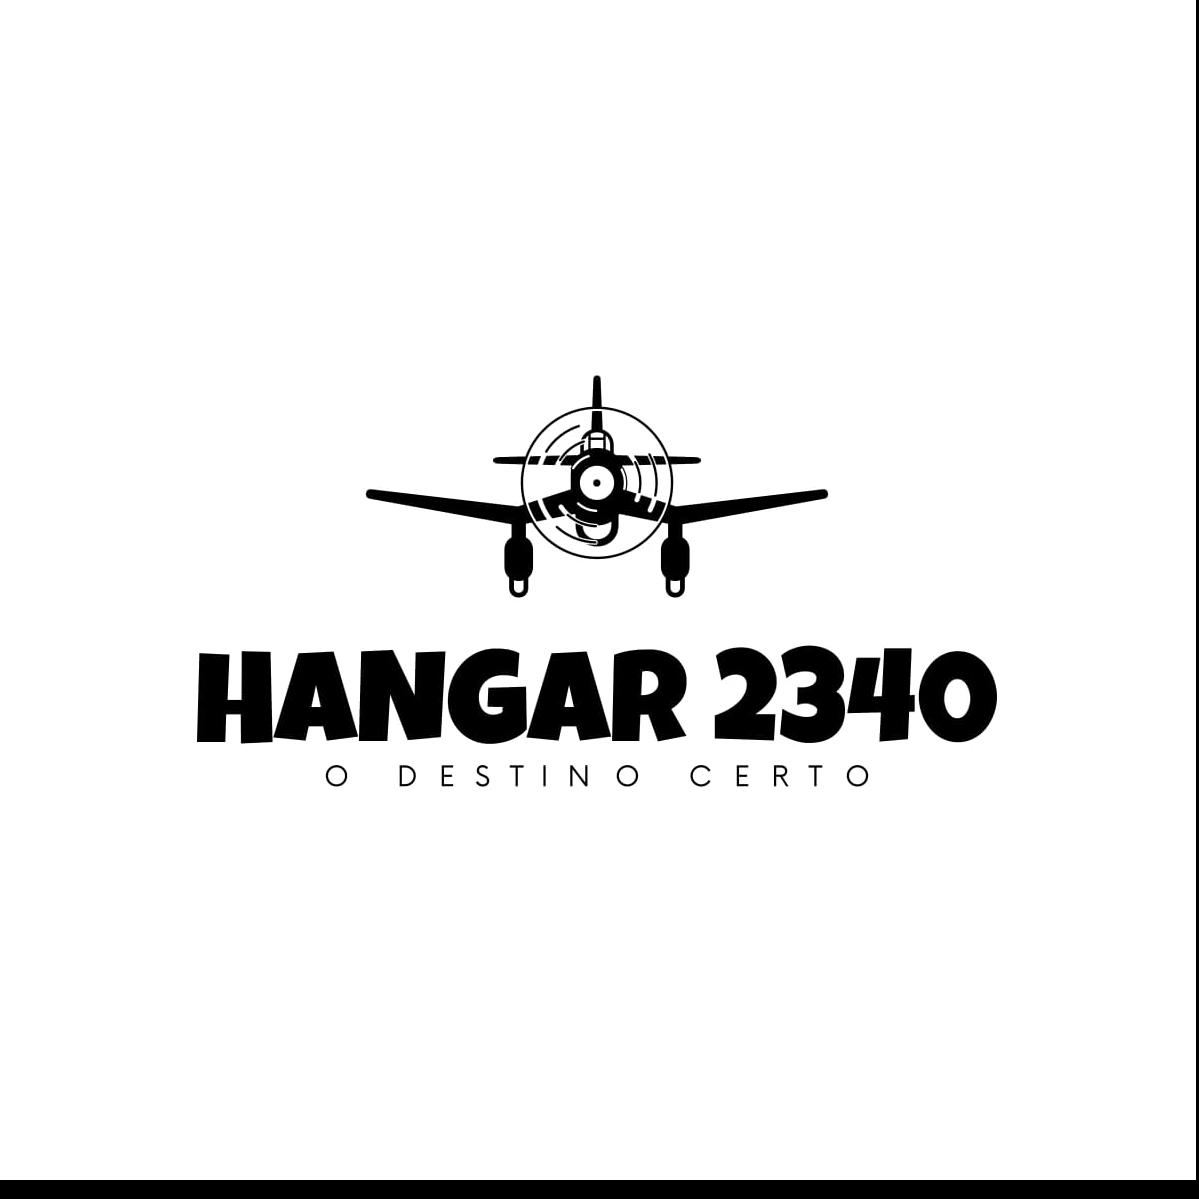 Hangar2340